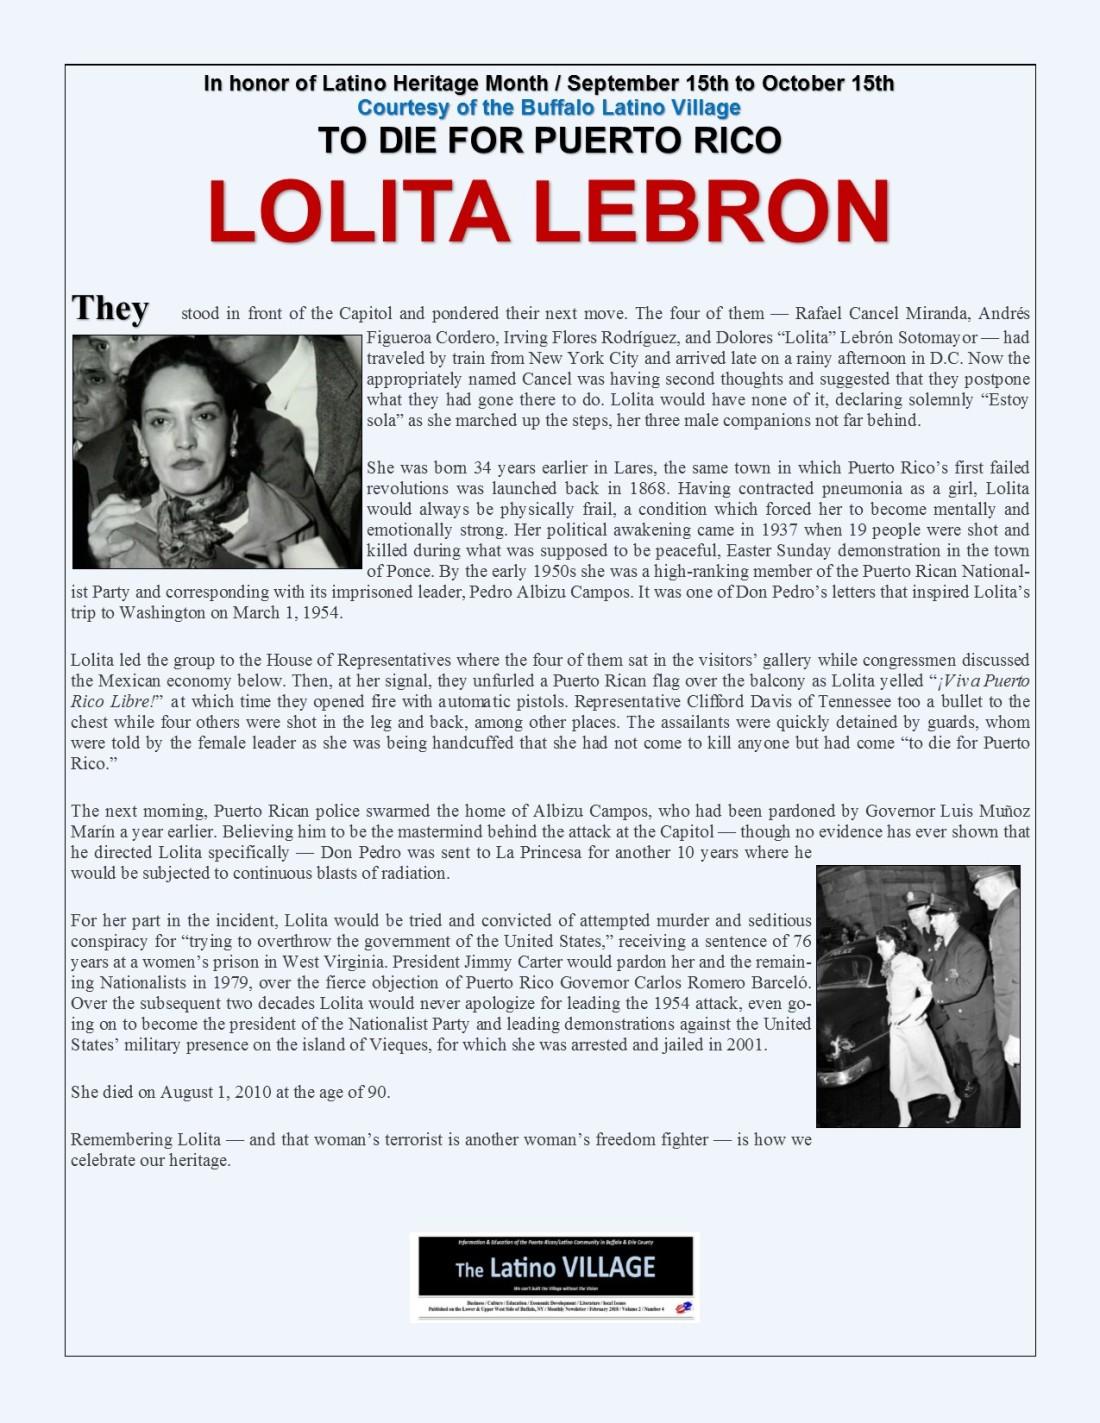 Lolita Lebron